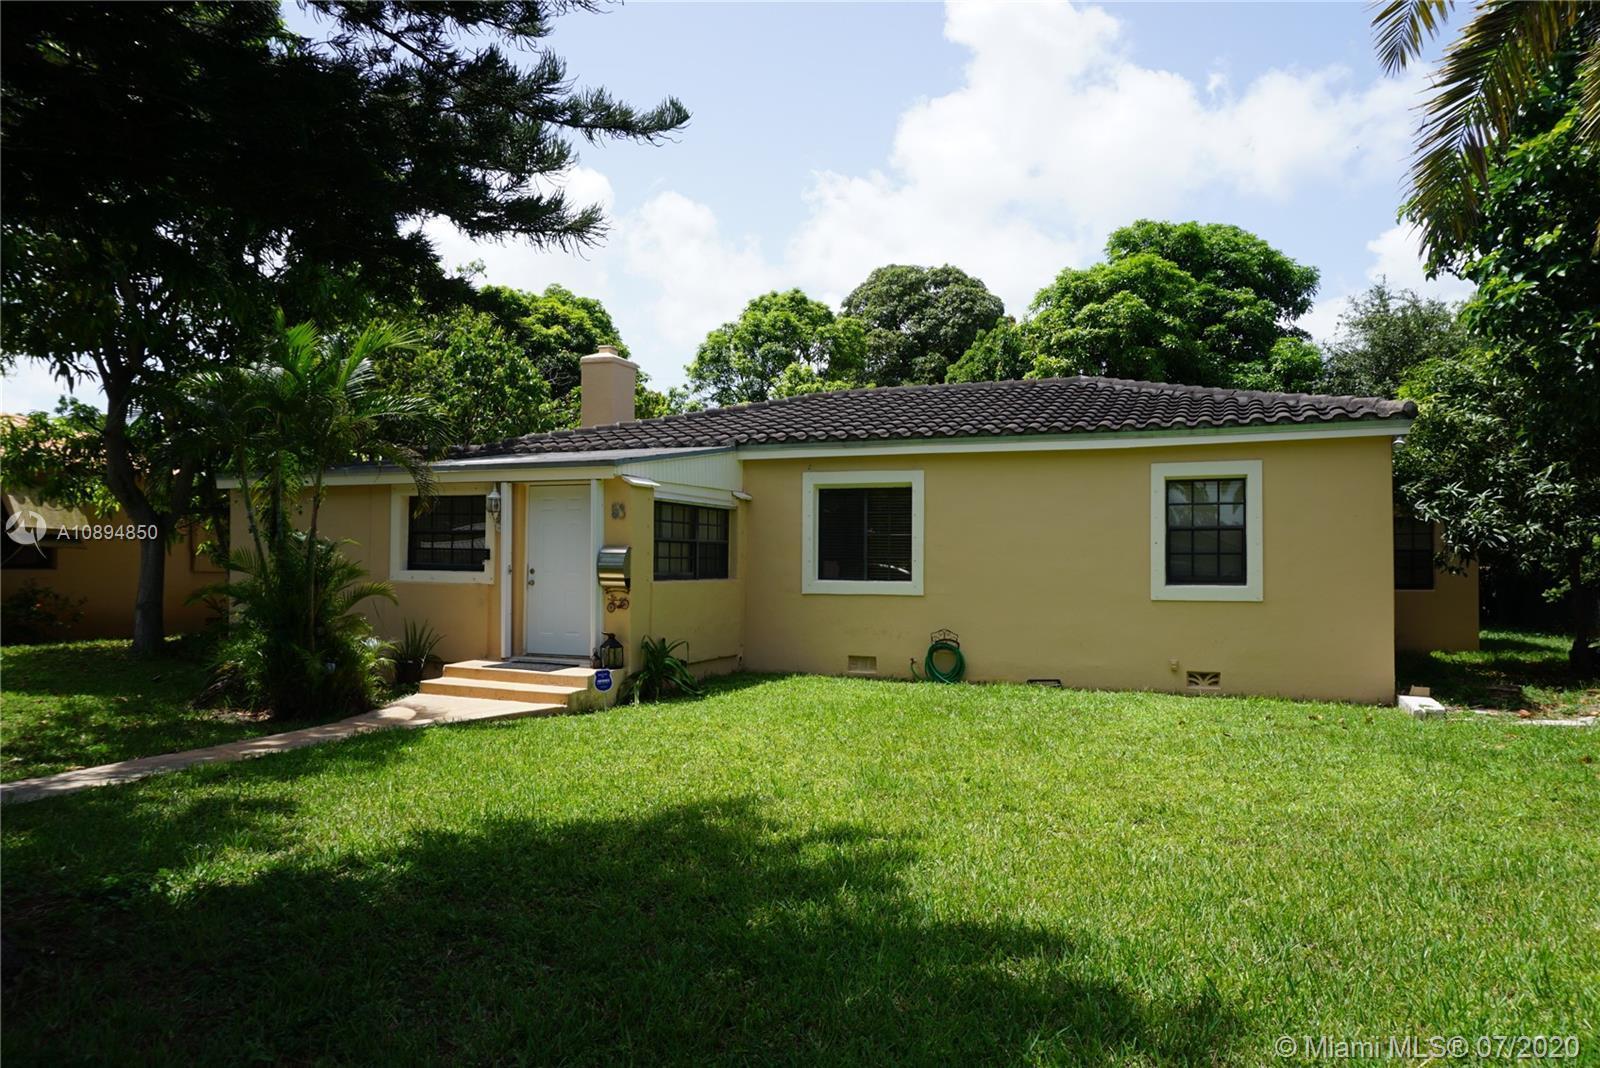 Beautiful Miami Shores 3 bdr 2 bth 1 car garage  Wide Center Island Landscaped Street Oak and Tile